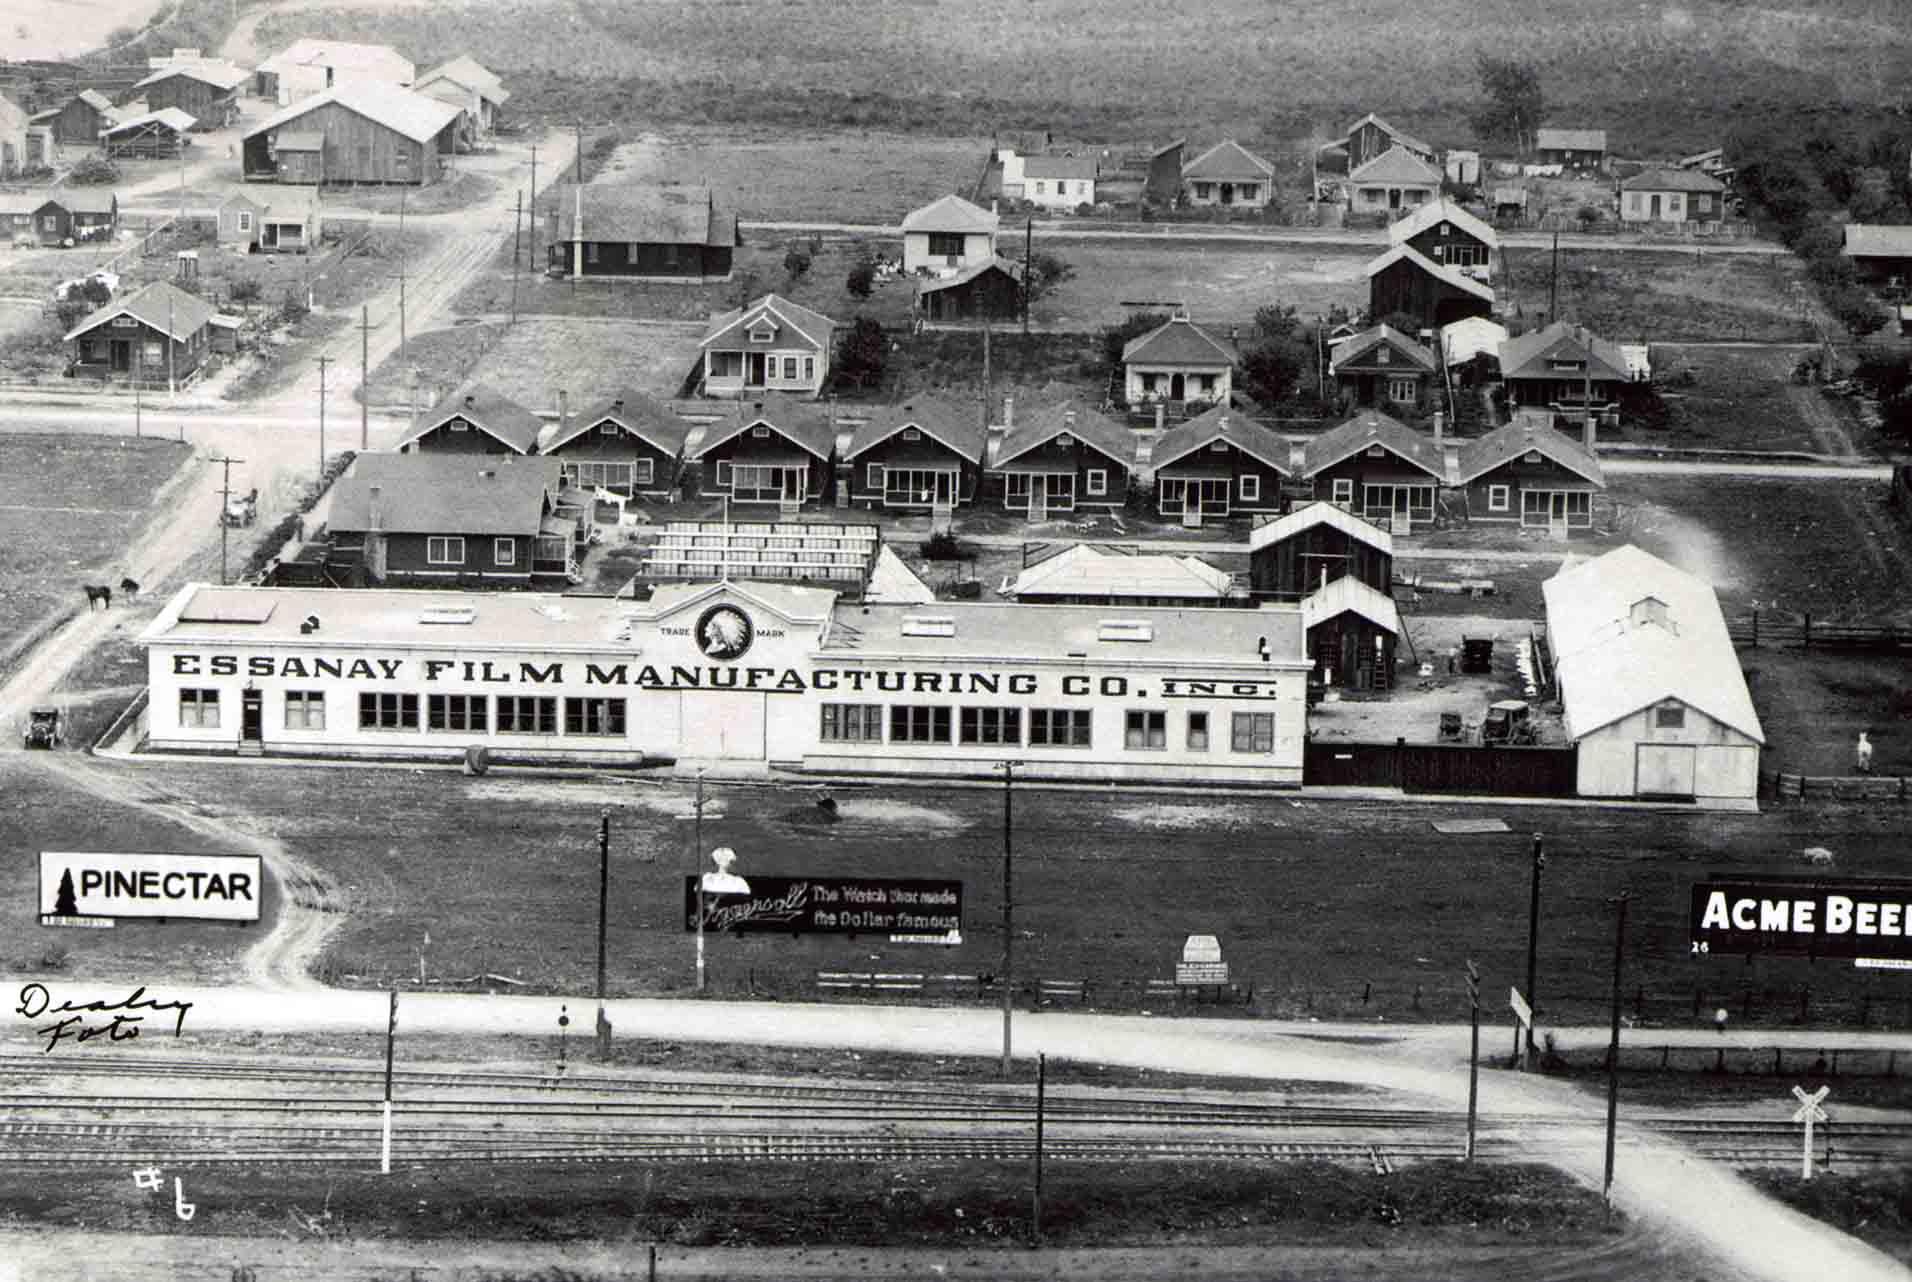 Vintage photo of early Movie Studios